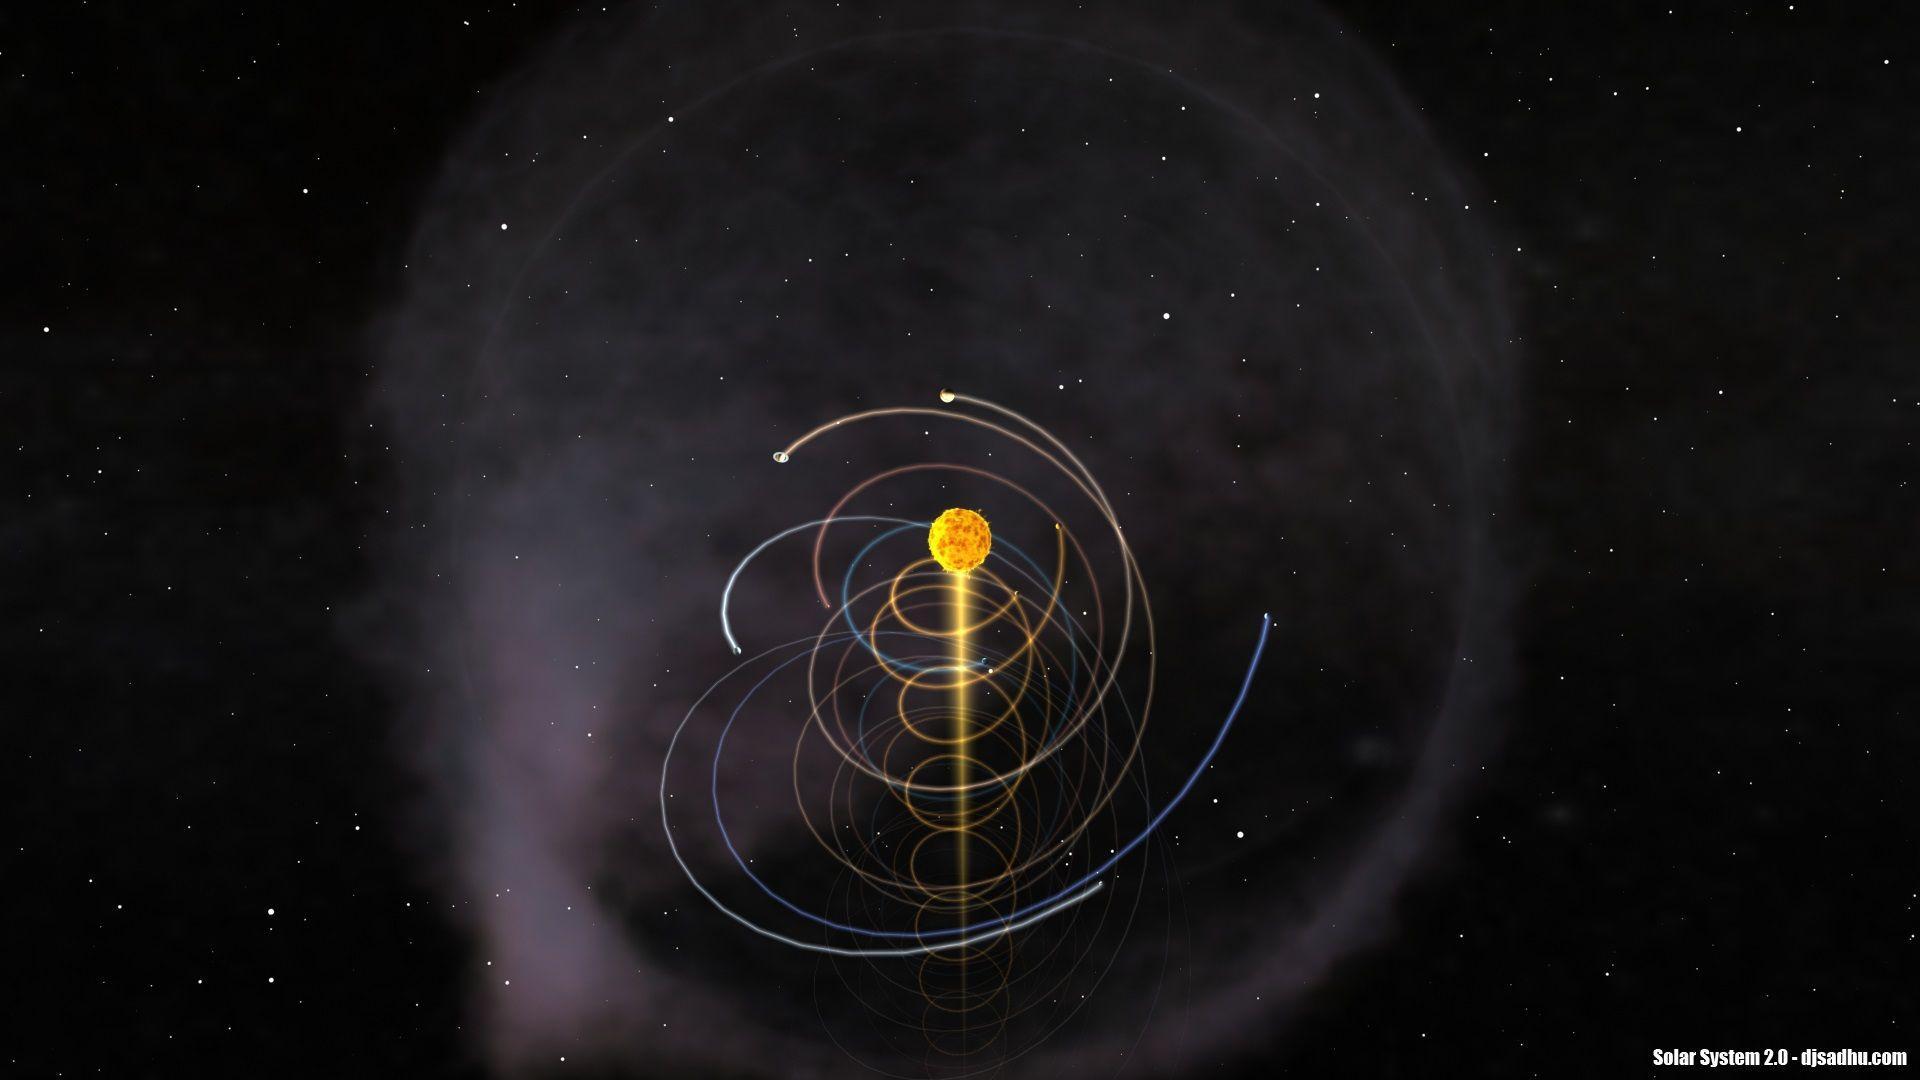 solar system hd wallpaper - photo #32